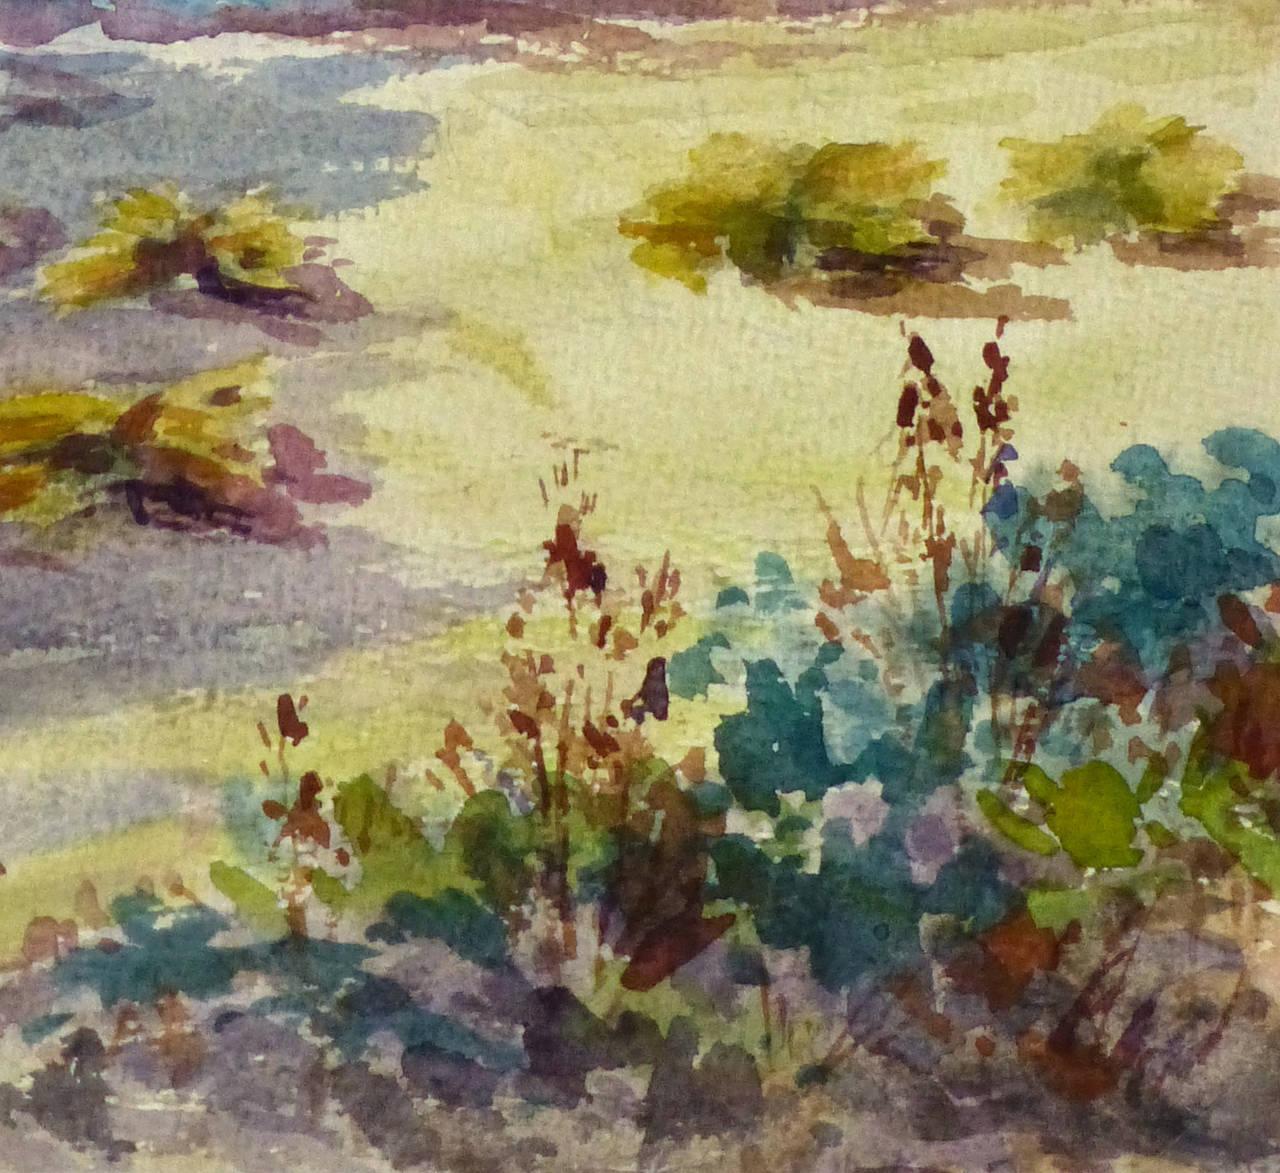 Vintage French Watercolor Landscape - The Hay Field - Black Landscape Art by Roger Tochon